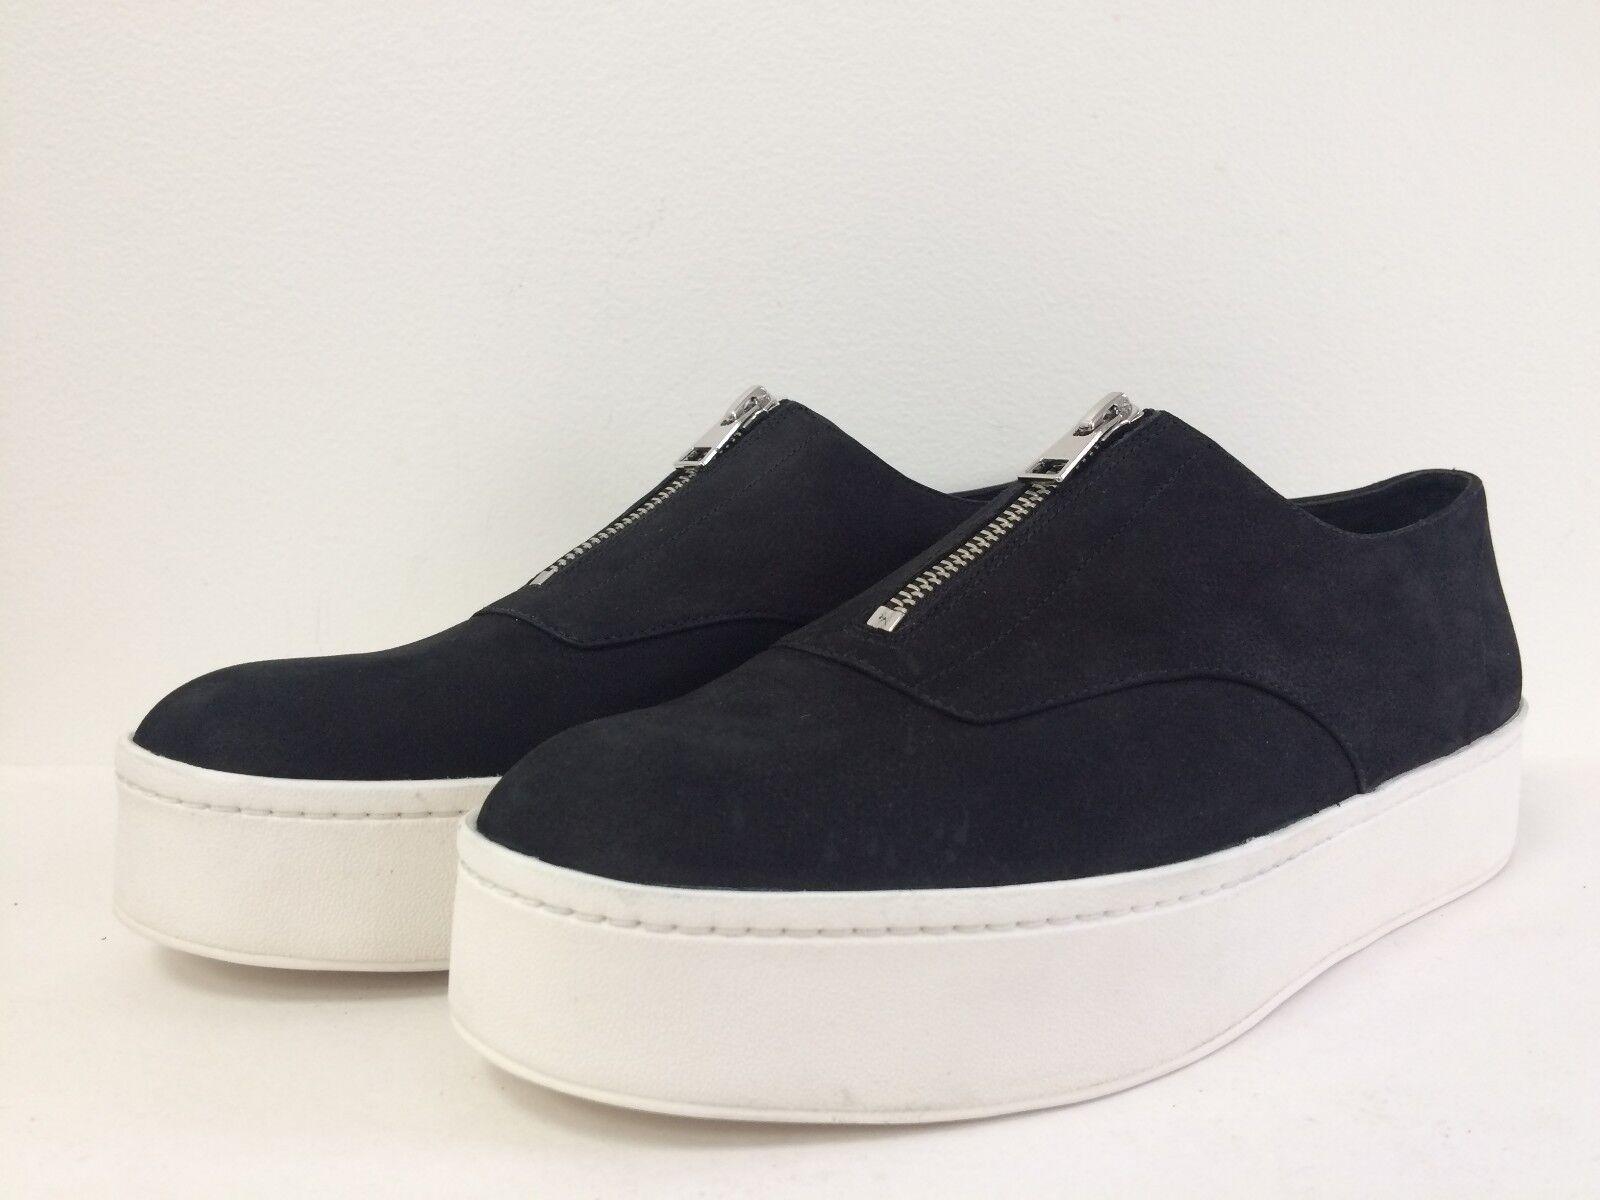 New VINCE Warner Nubuck Leder Sneaker Platform Slip On Zip Sneaker Leder BLK Grau 8.5 9 9.5 3976c3